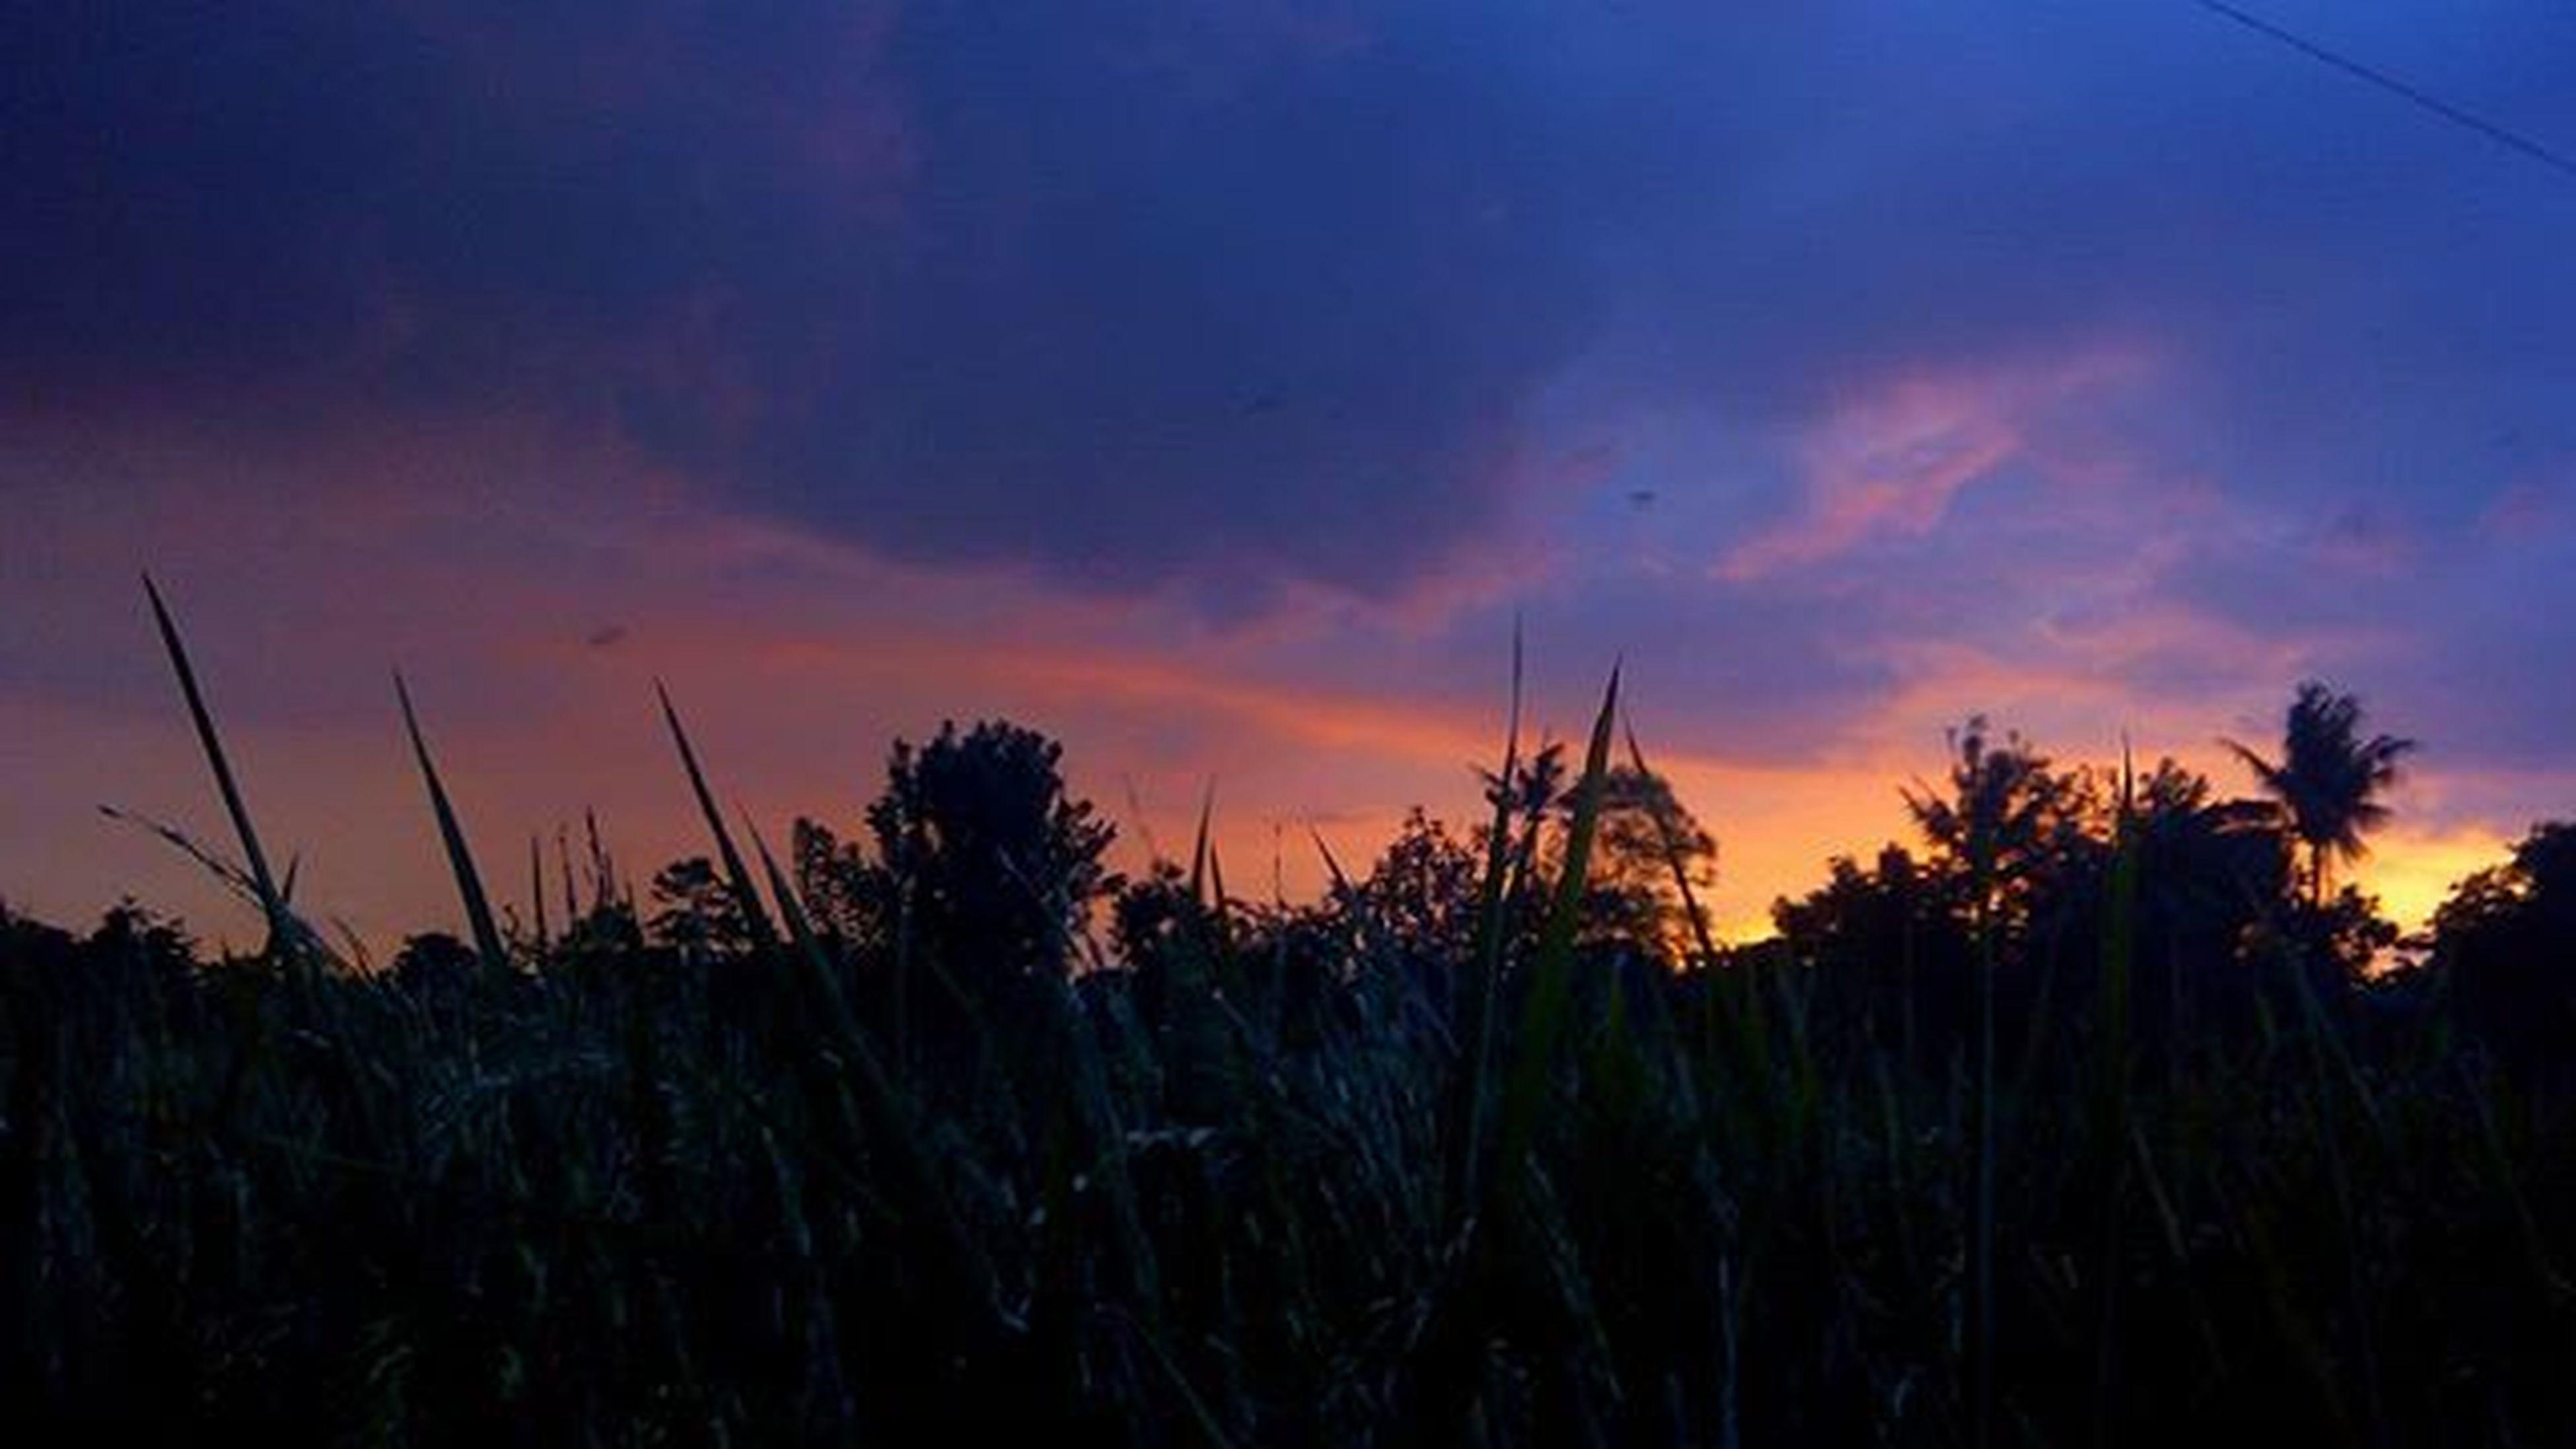 Senja  Sunset Bekasimembekasdihati 1day1klick Wepe67photography Mobilphonephotography Explore_Bekasi